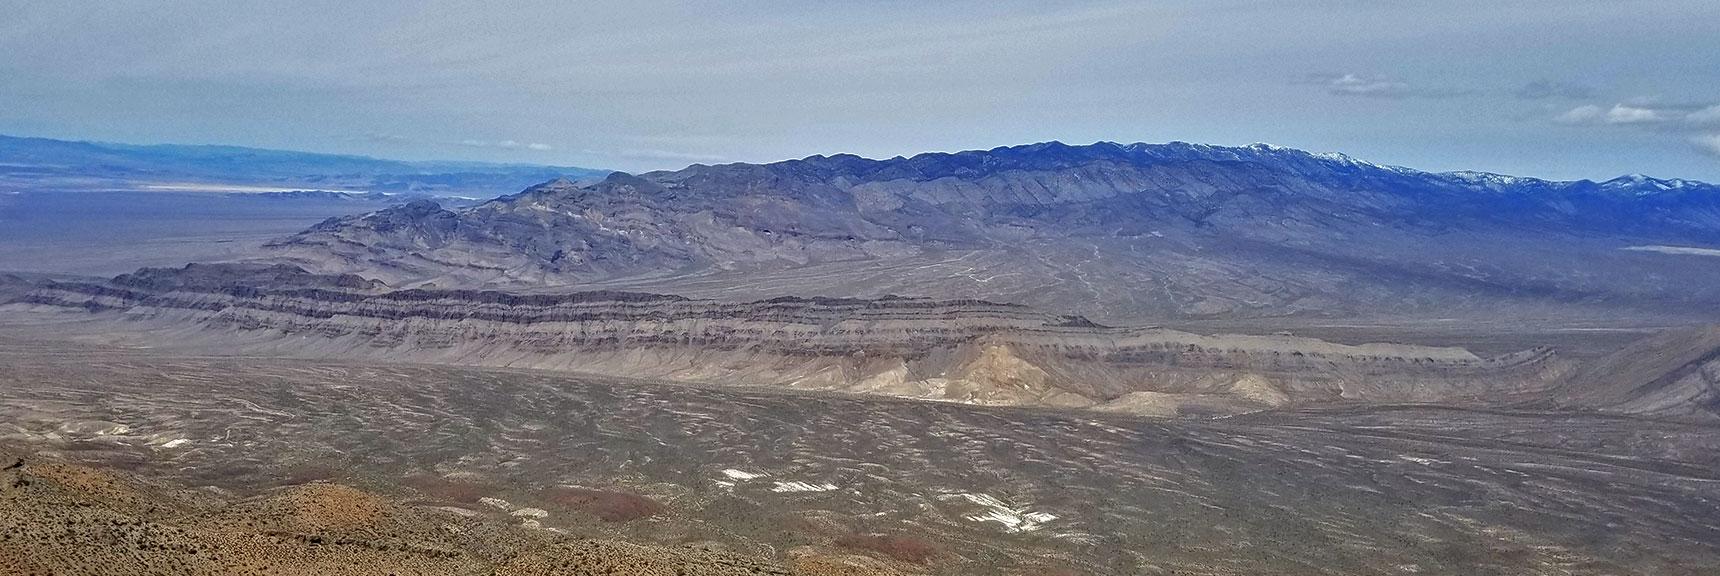 View North Toward the Sheep Range fro Gass Peak Eastern Summit | Gass Peak Eastern Summit Ultra-marathon Adventure, Nevada